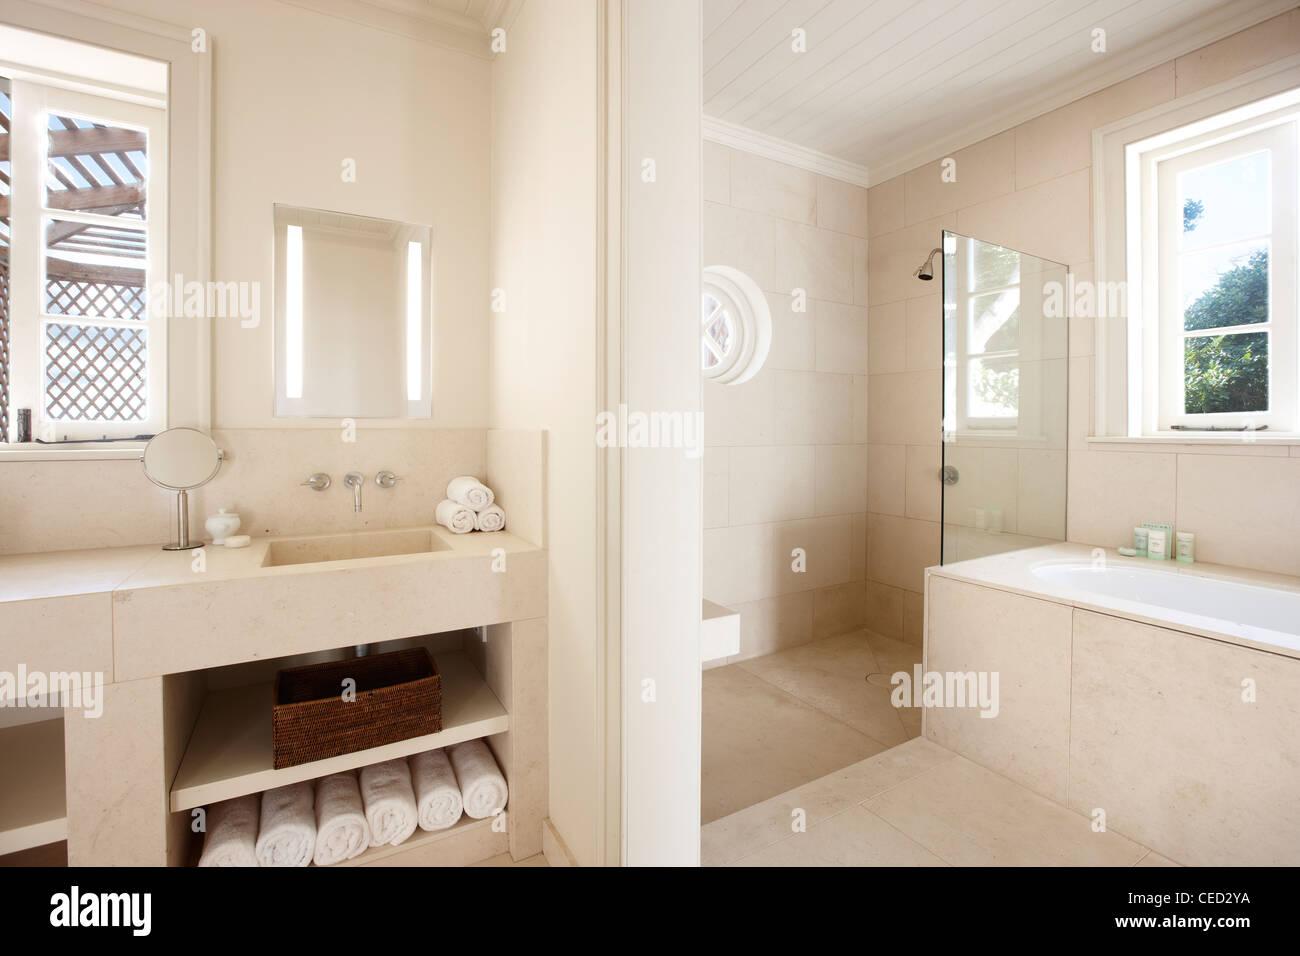 Bathroom Suite Stock Photos & Bathroom Suite Stock Images - Alamy